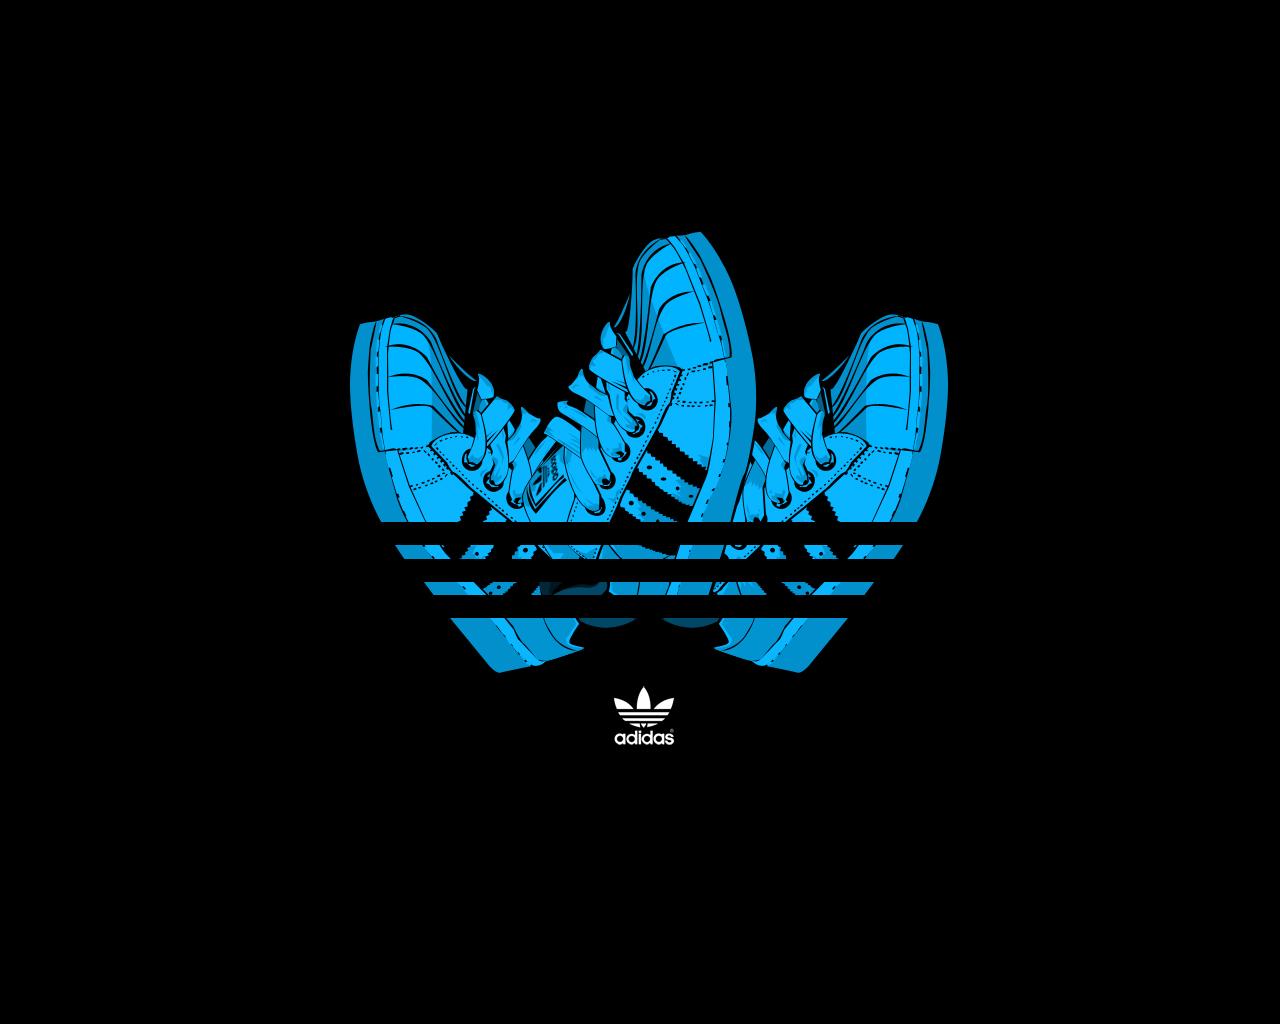 adidas wallpaper 8914